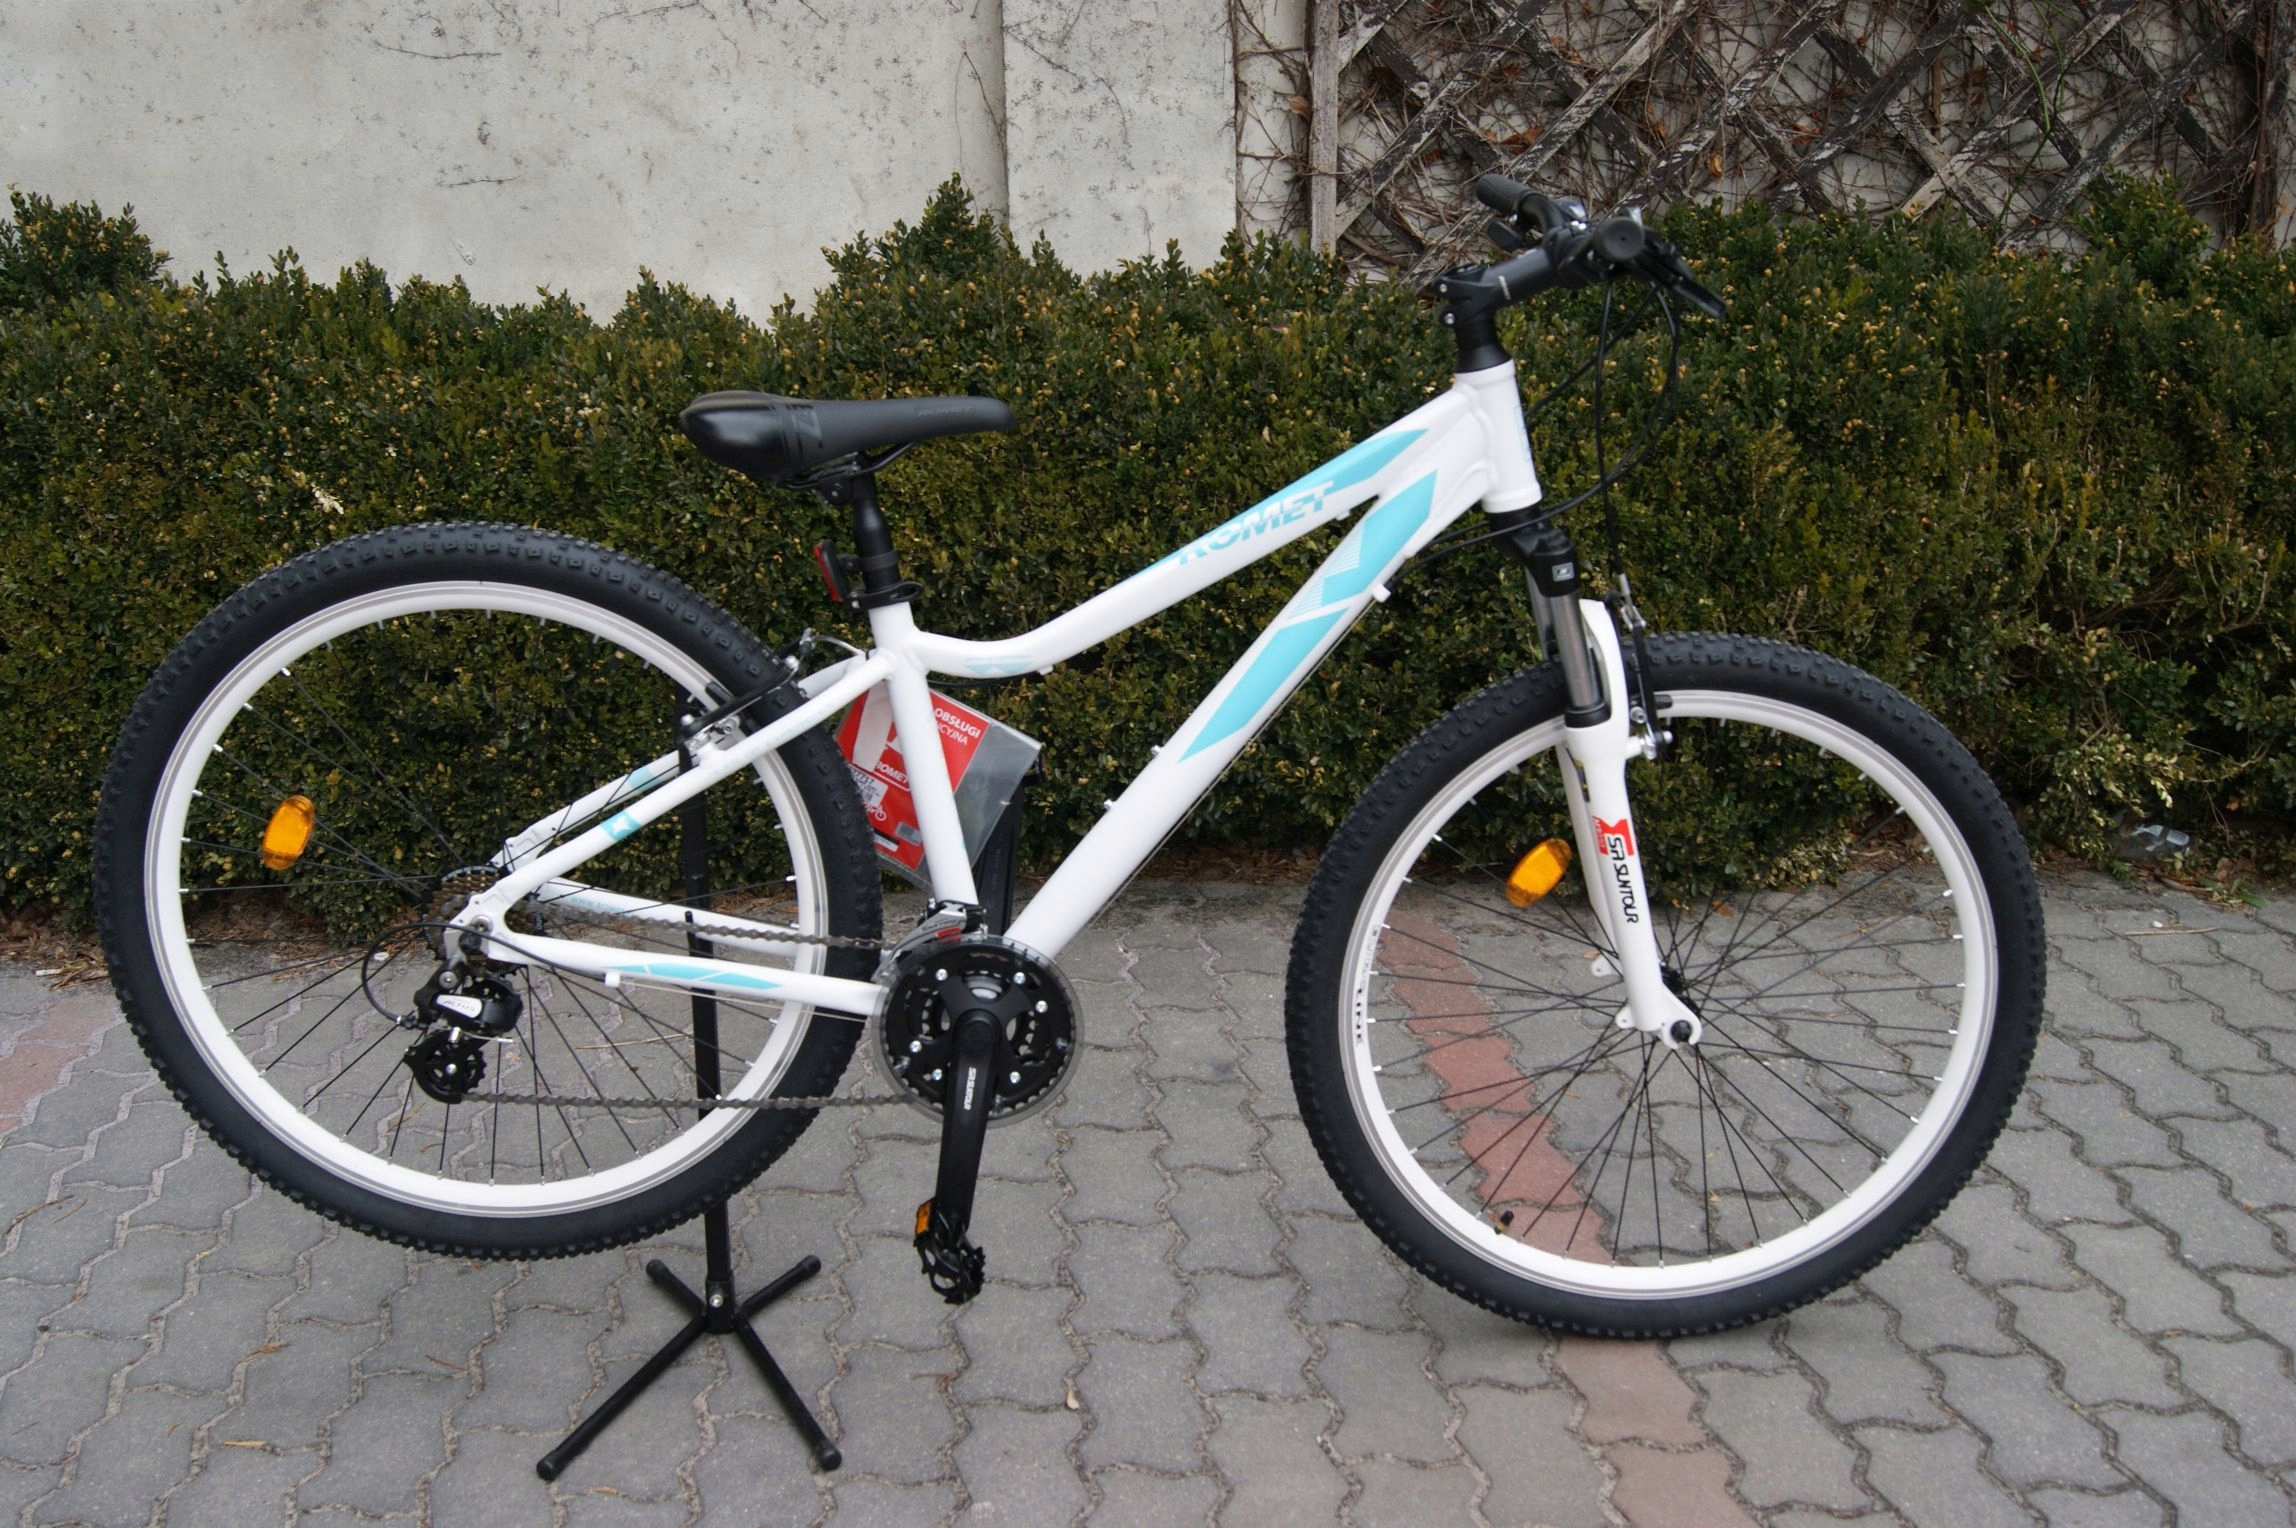 R226 Aluminiowy damski rower górski Romet 27,5''